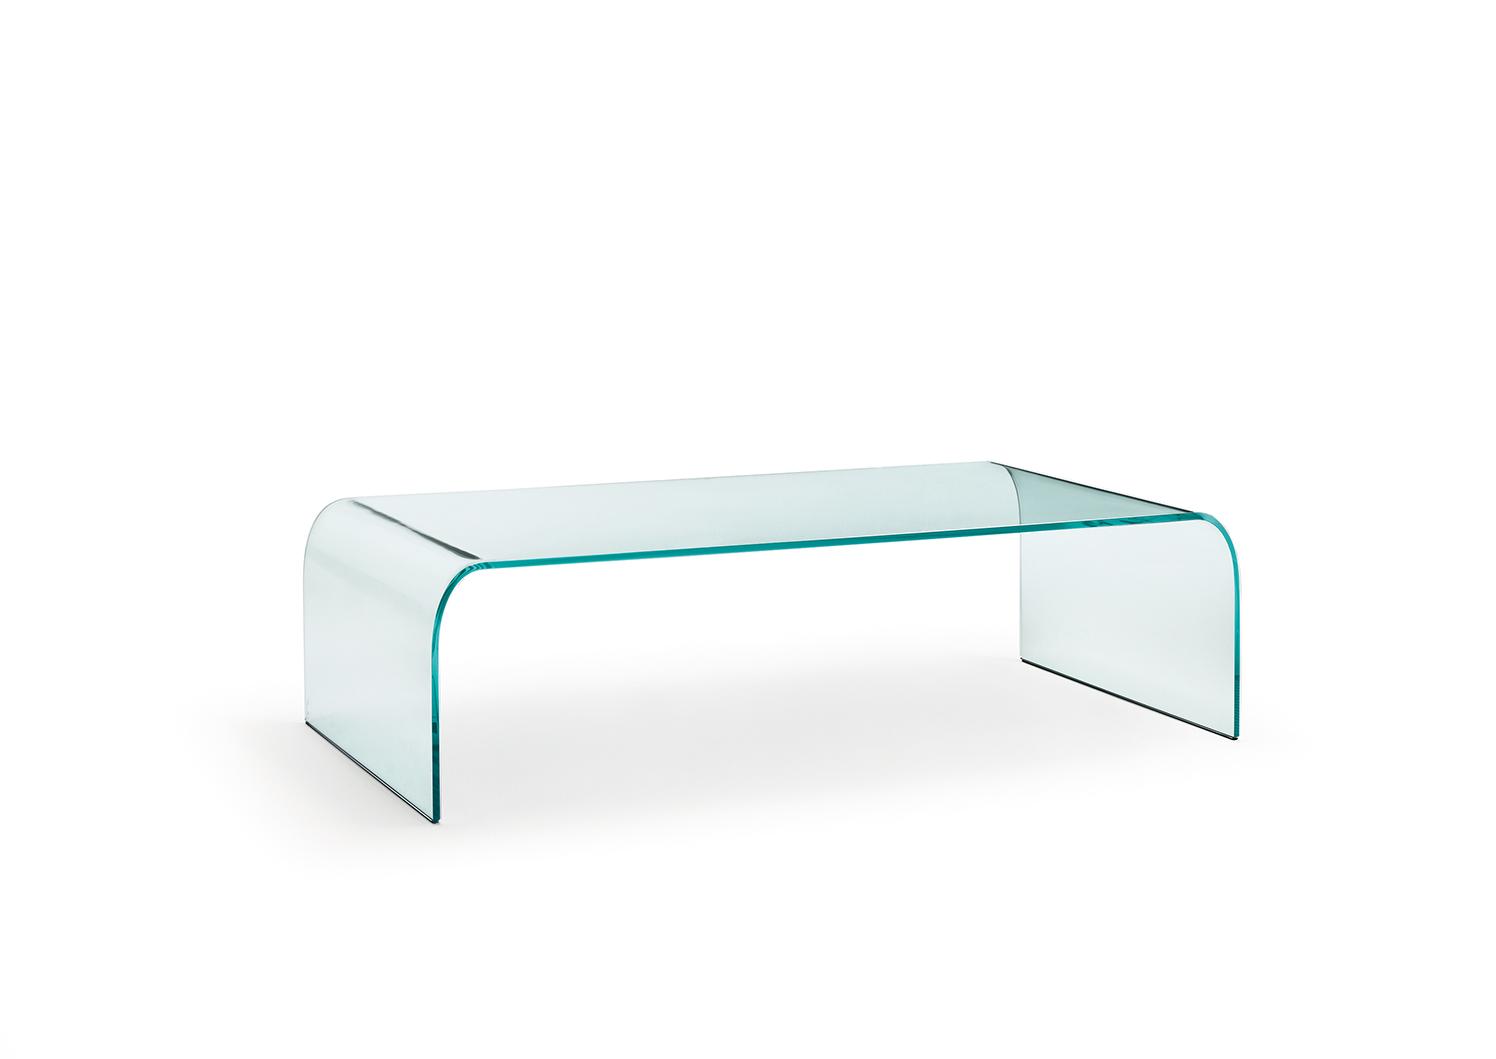 Salontafel Glas Rechthoekig.Fiam Glazen Salontafel Ponte Vierkant